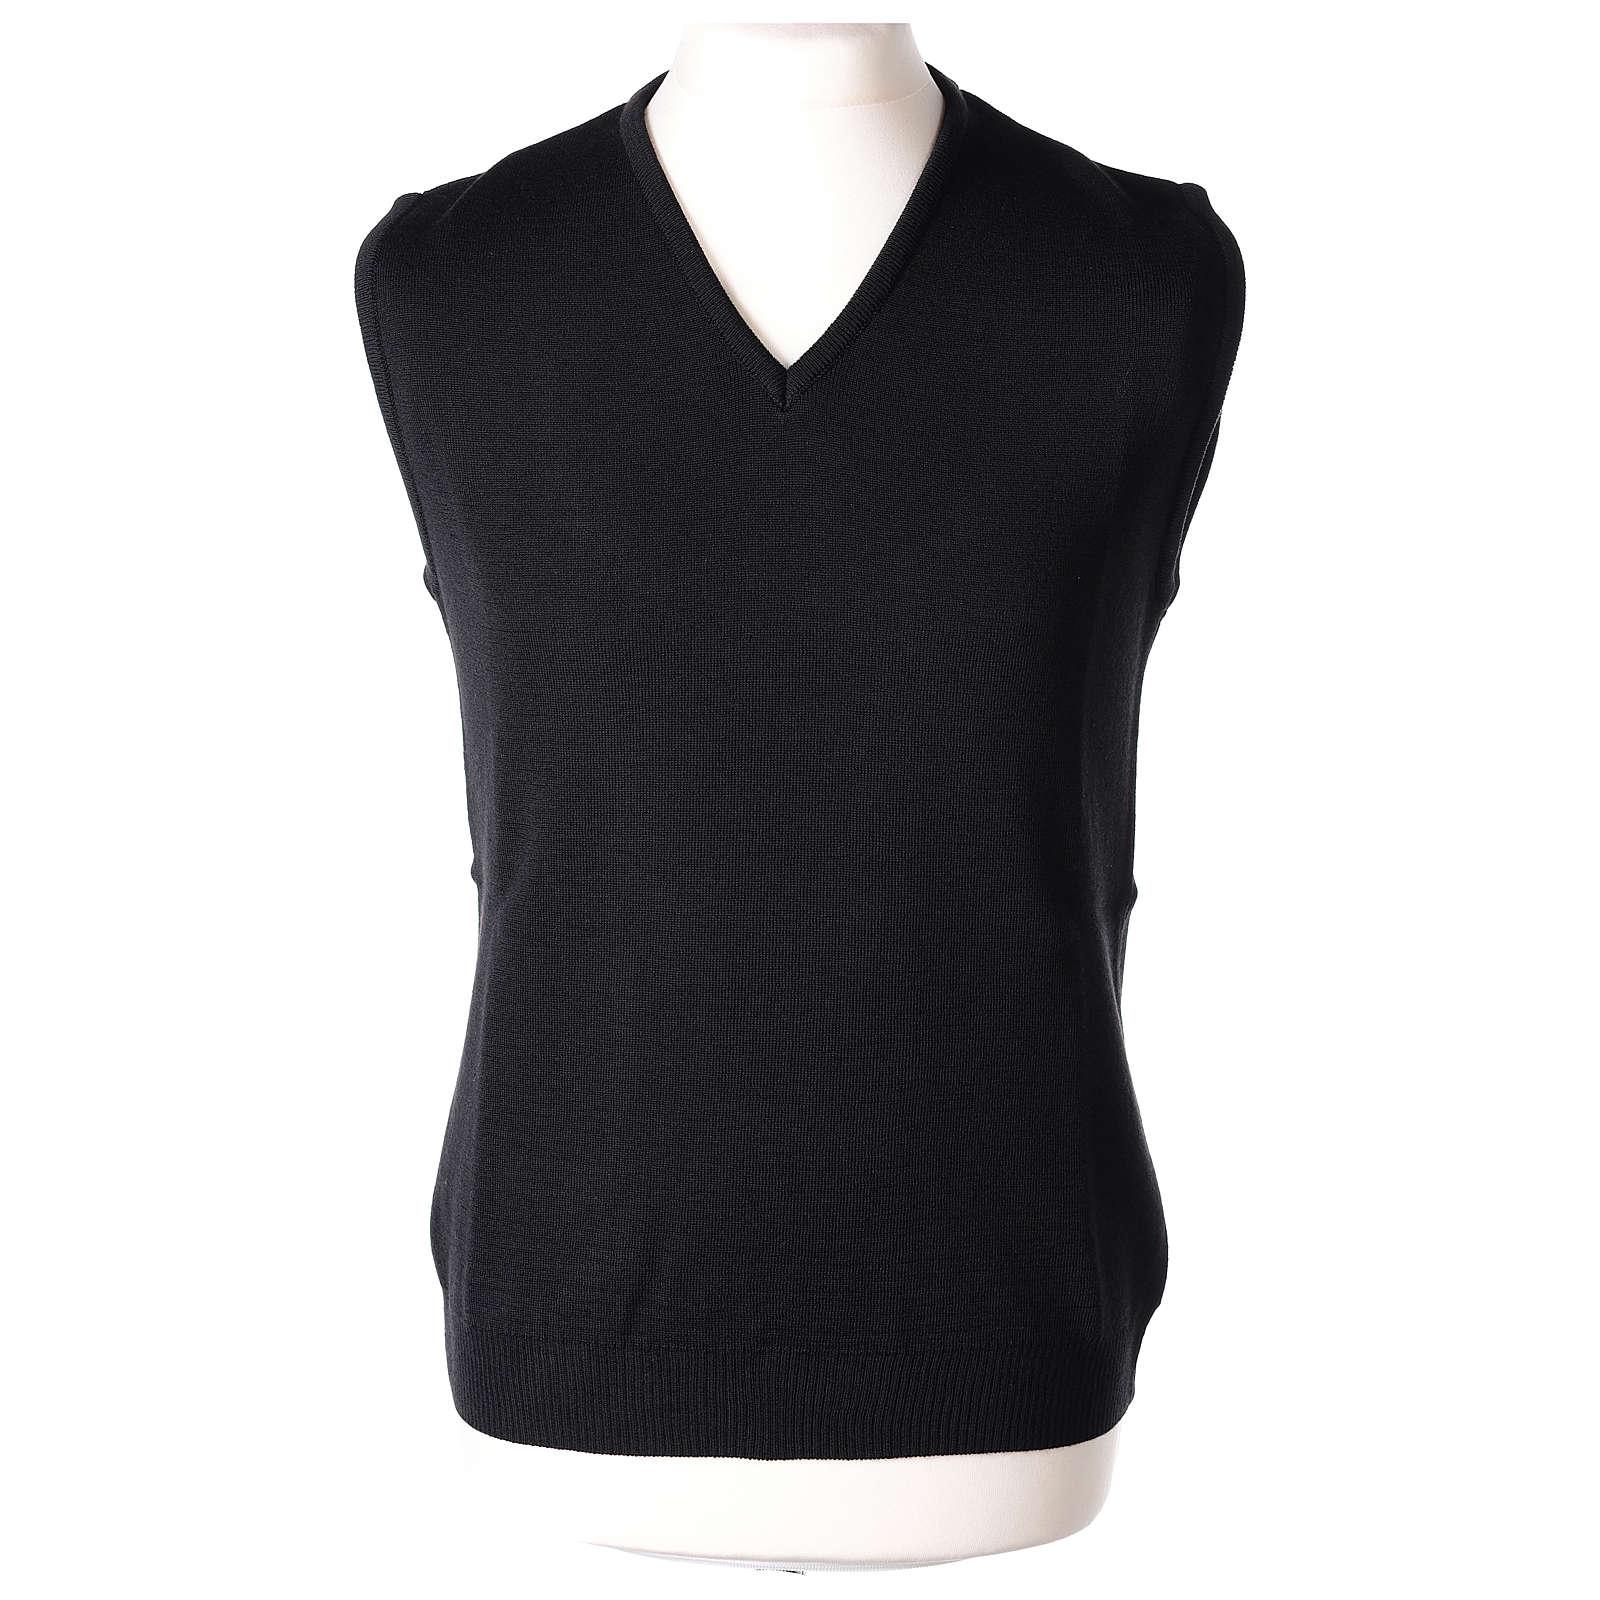 Gilet sacerdote nero in maglia rasata 50% acrilico 50% lana merino In Primis 4